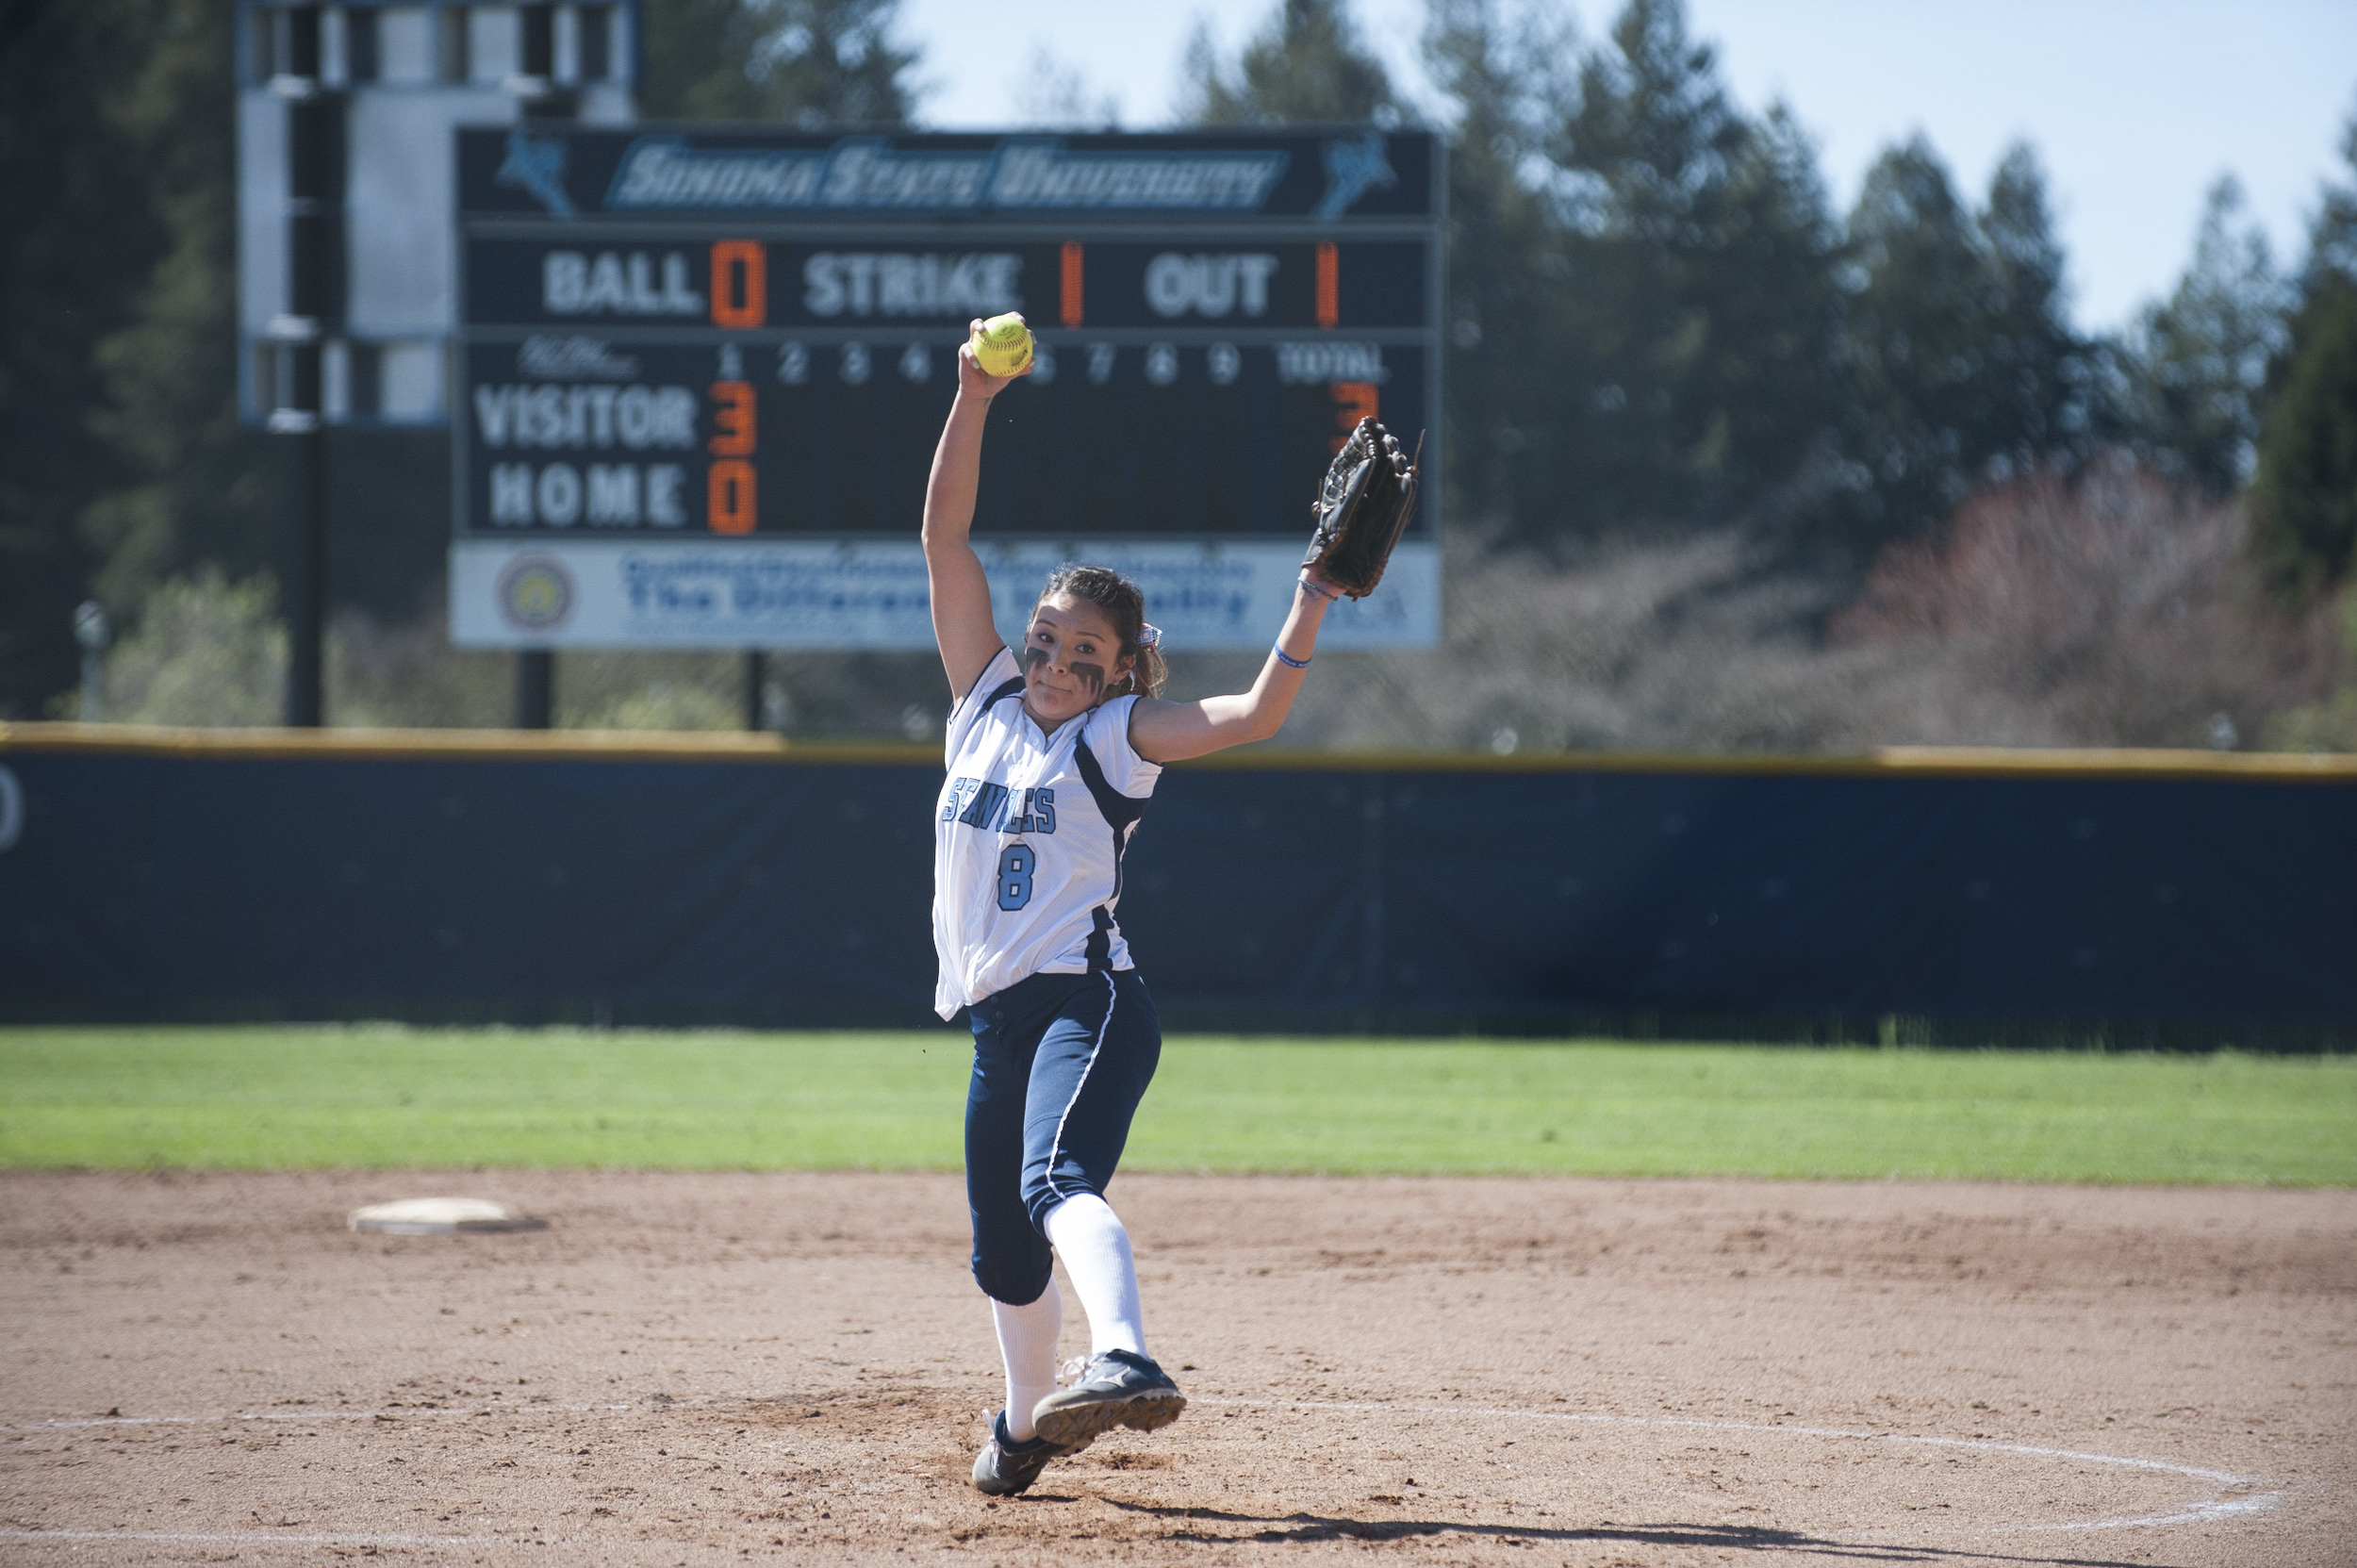 SSU Softball pitcher